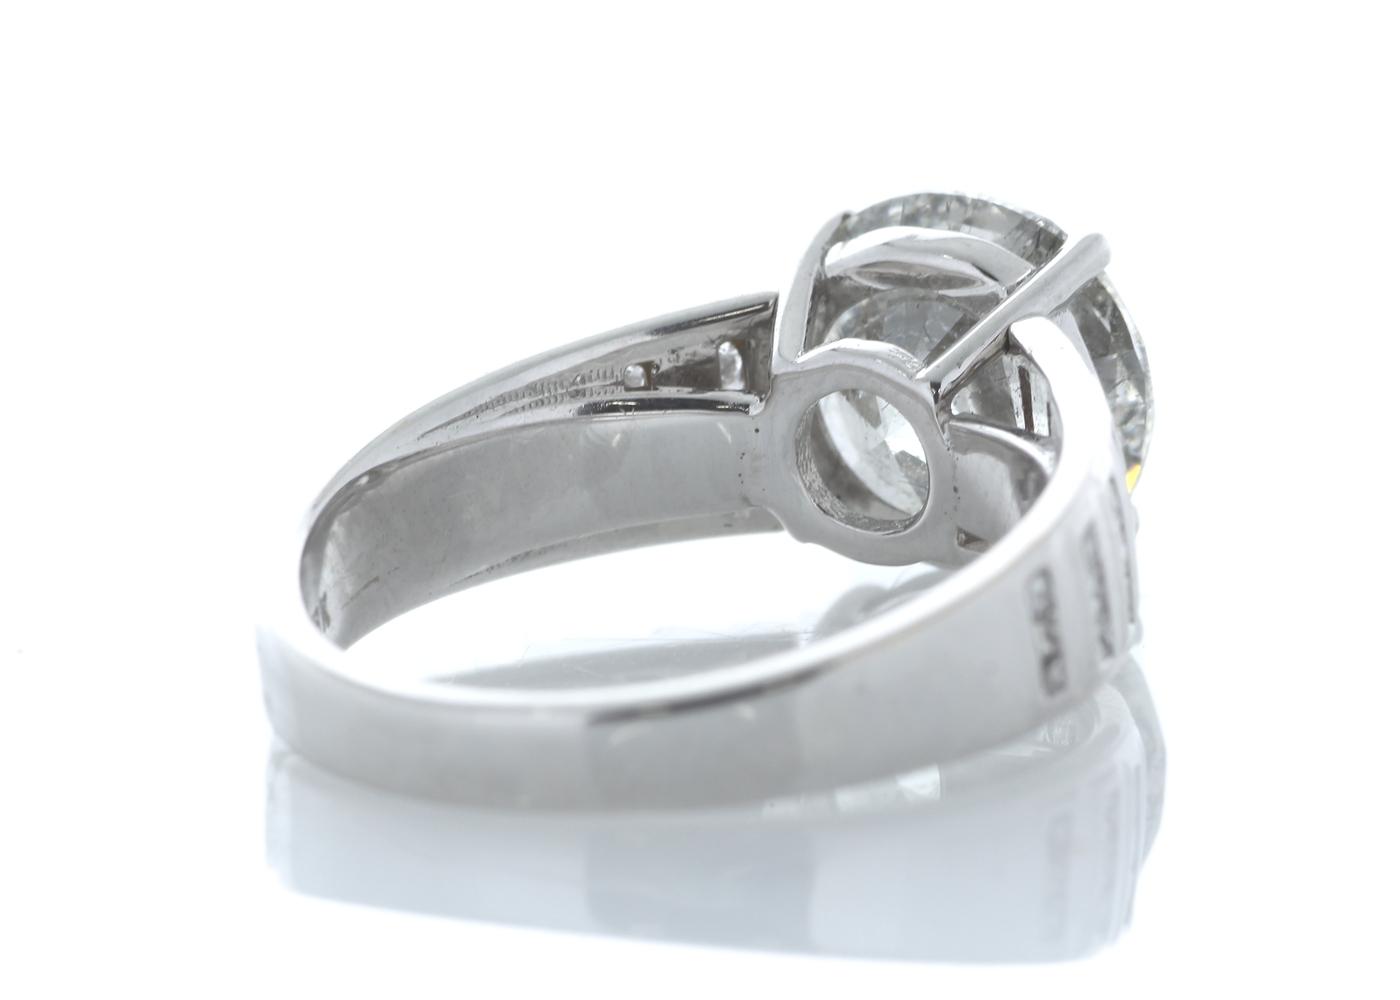 18ct White Gold Single Stone Prong Set With Stone Set Shoulders Diamond Ring 4.65 Carats - Image 3 of 5